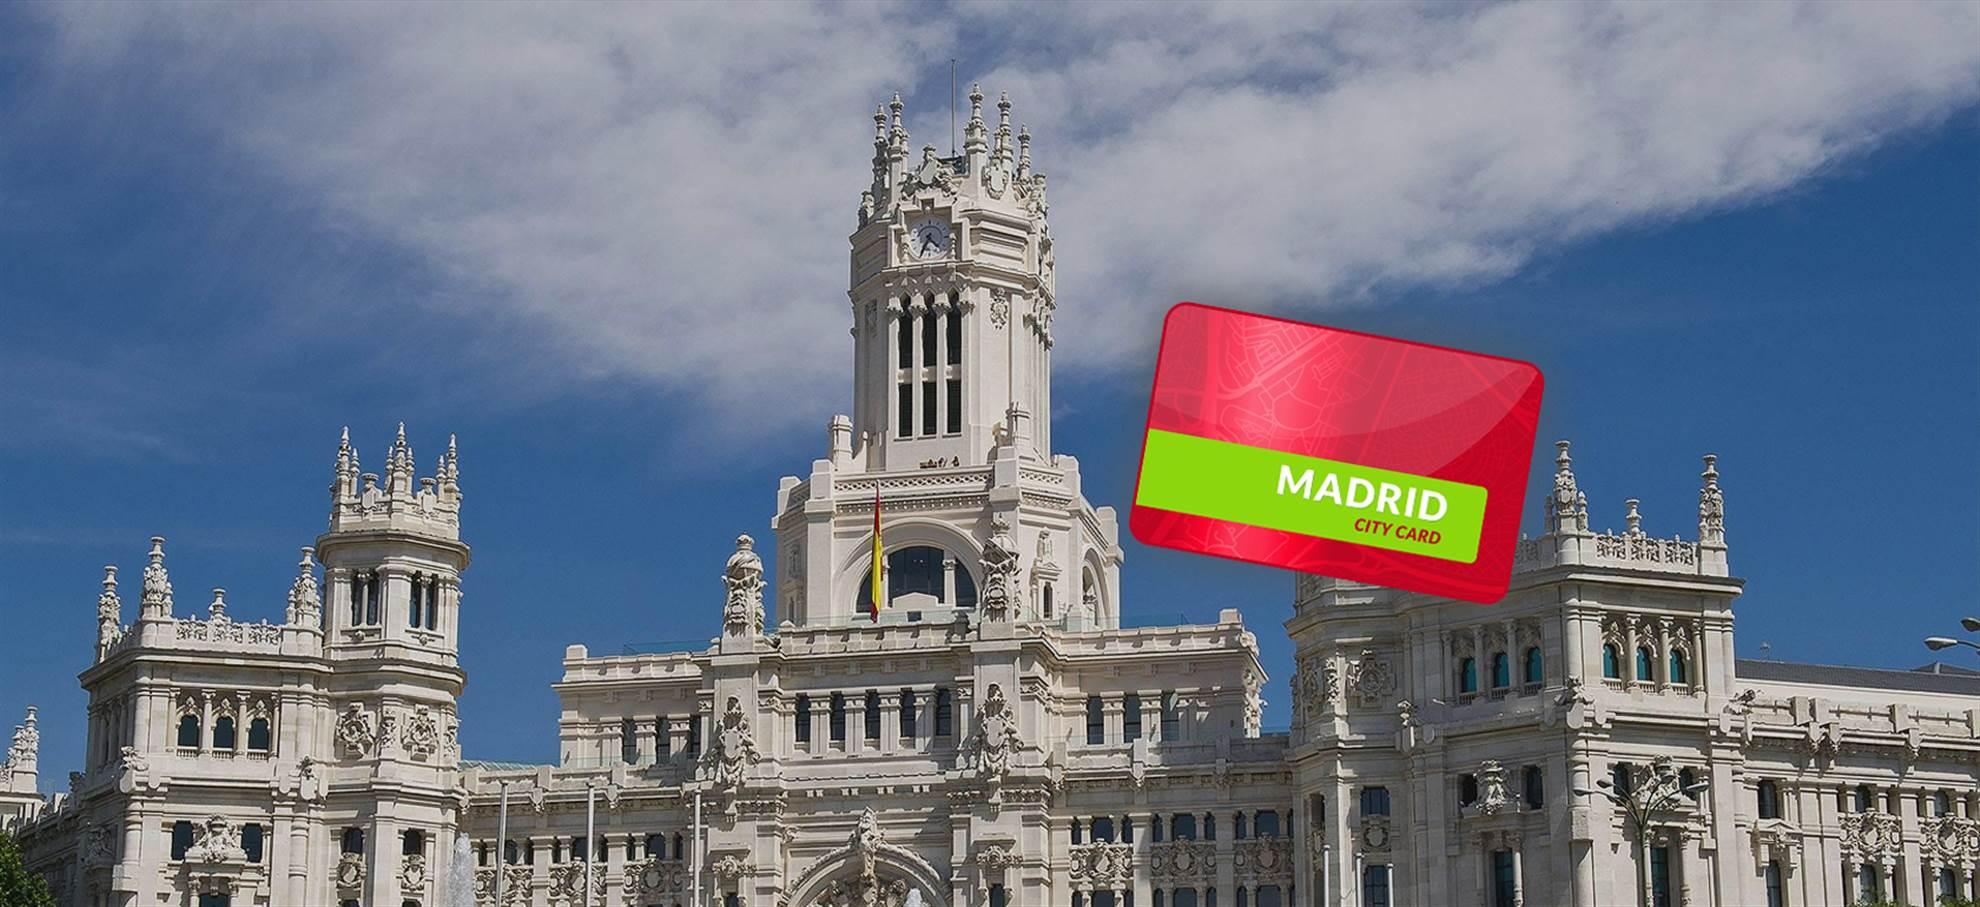 Madrid City Pass (Prado Museum, Koninklijk Paleis, Optioneel OV-Kaart)